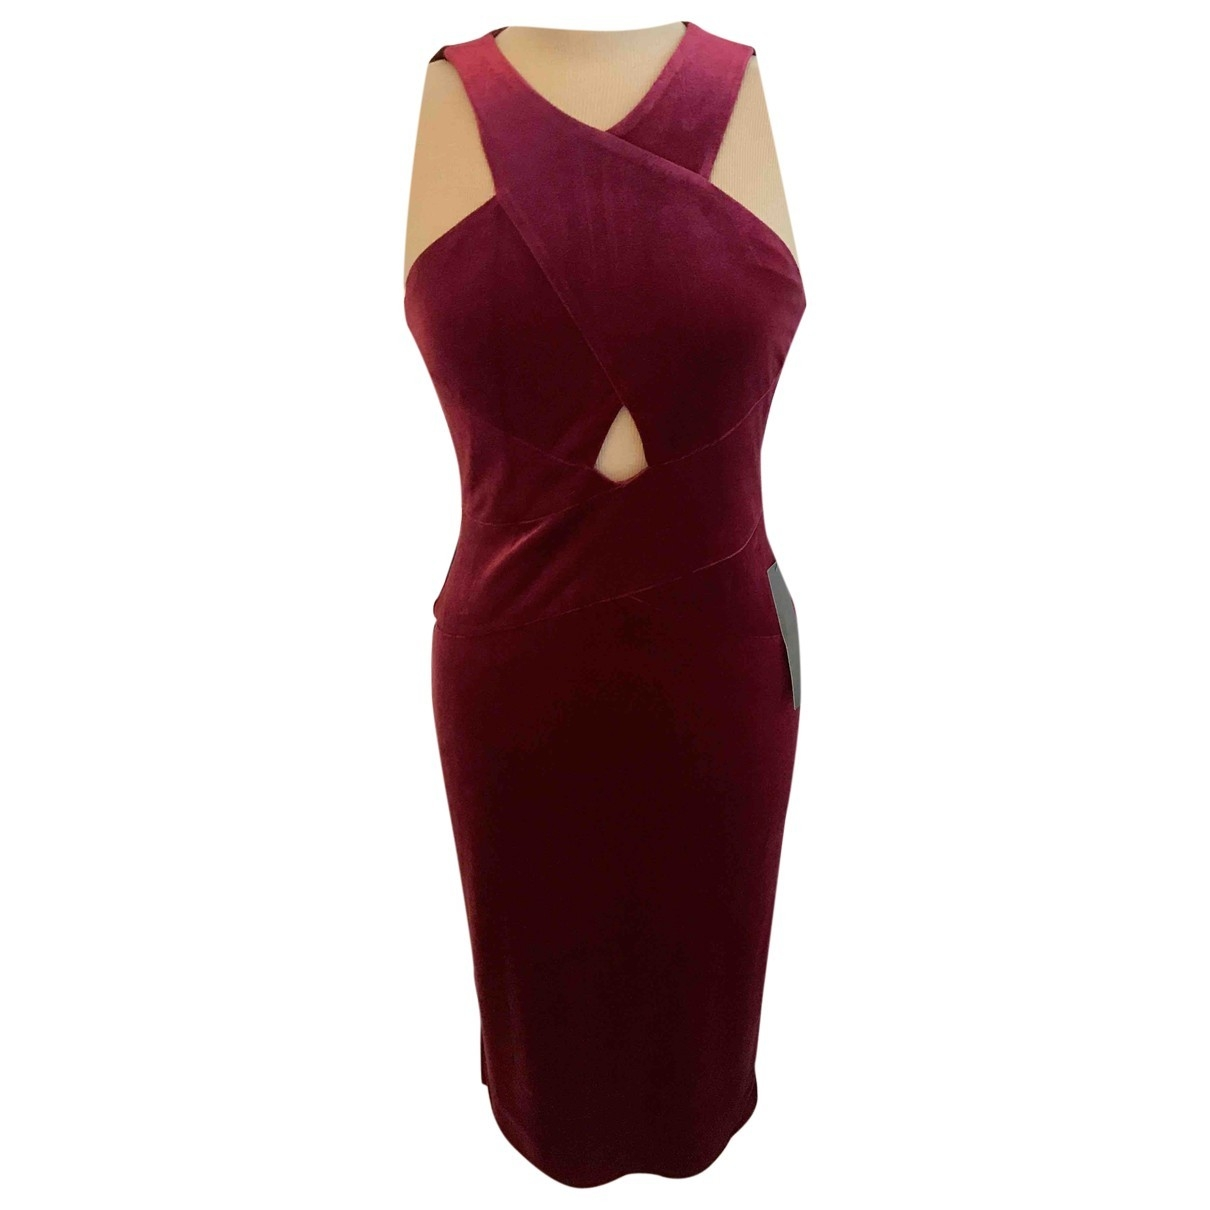 Bcbg Max Azria \N Kleid in  Bordeauxrot Polyester